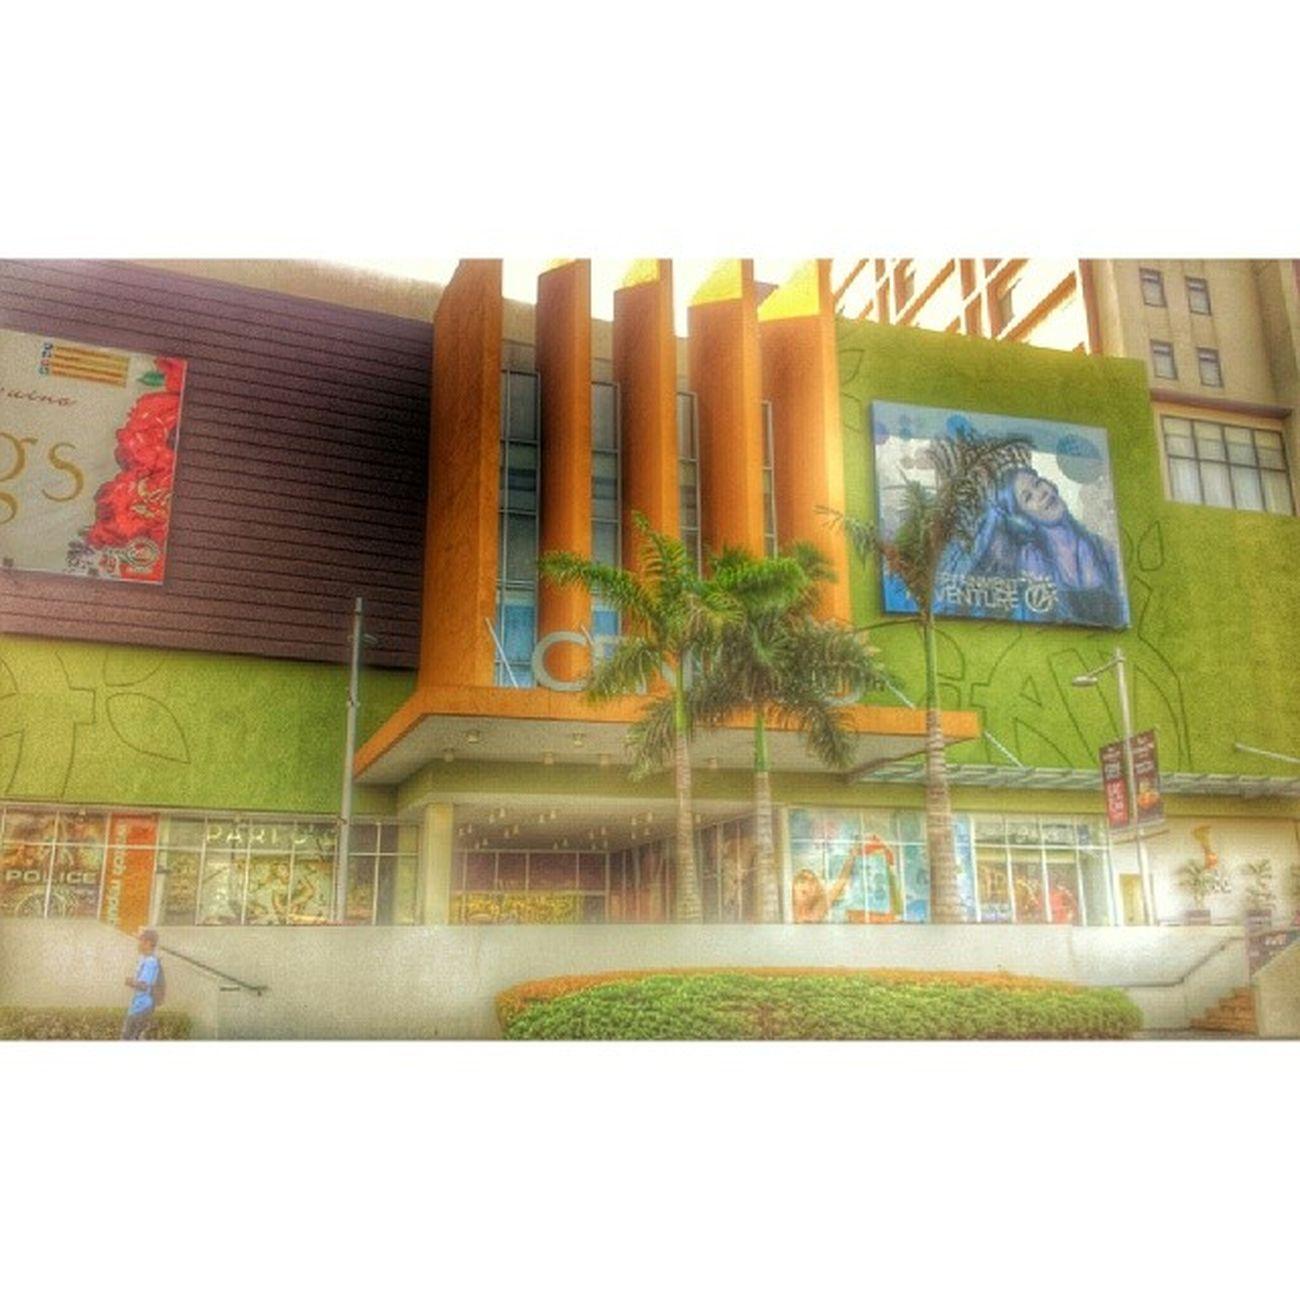 Centrio Mall Ayala Centrio CDO CagayanDeOro itsmorefuninthephilippines wowphilippines